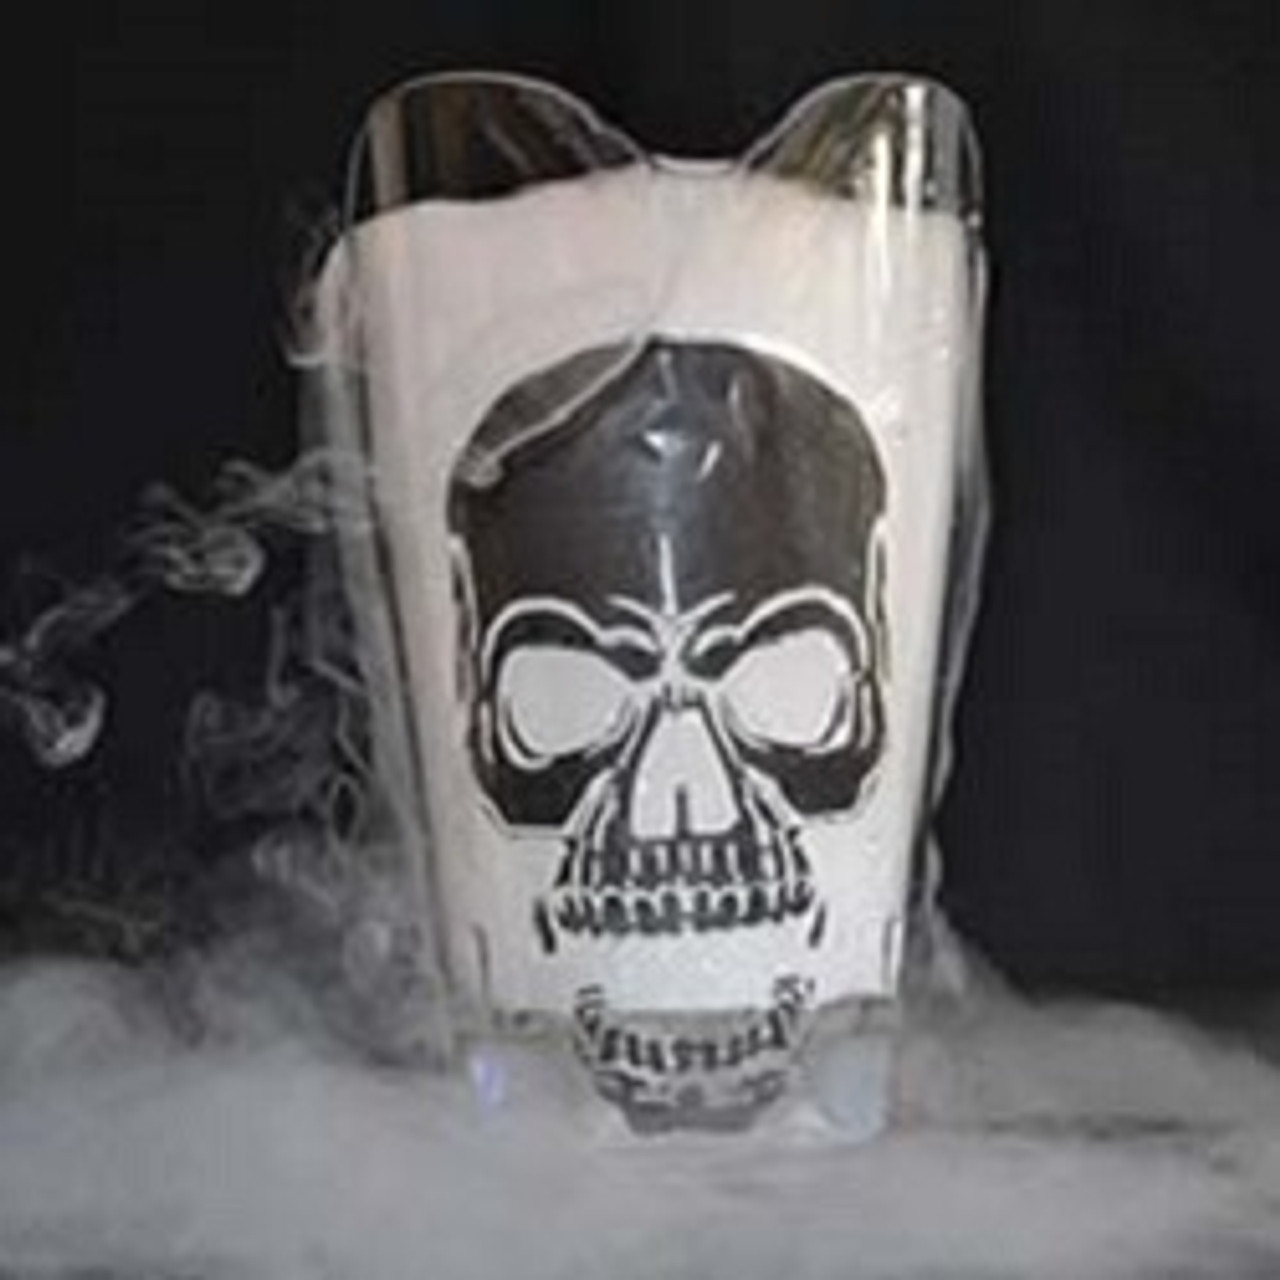 Skull Jug set for Dry Ice